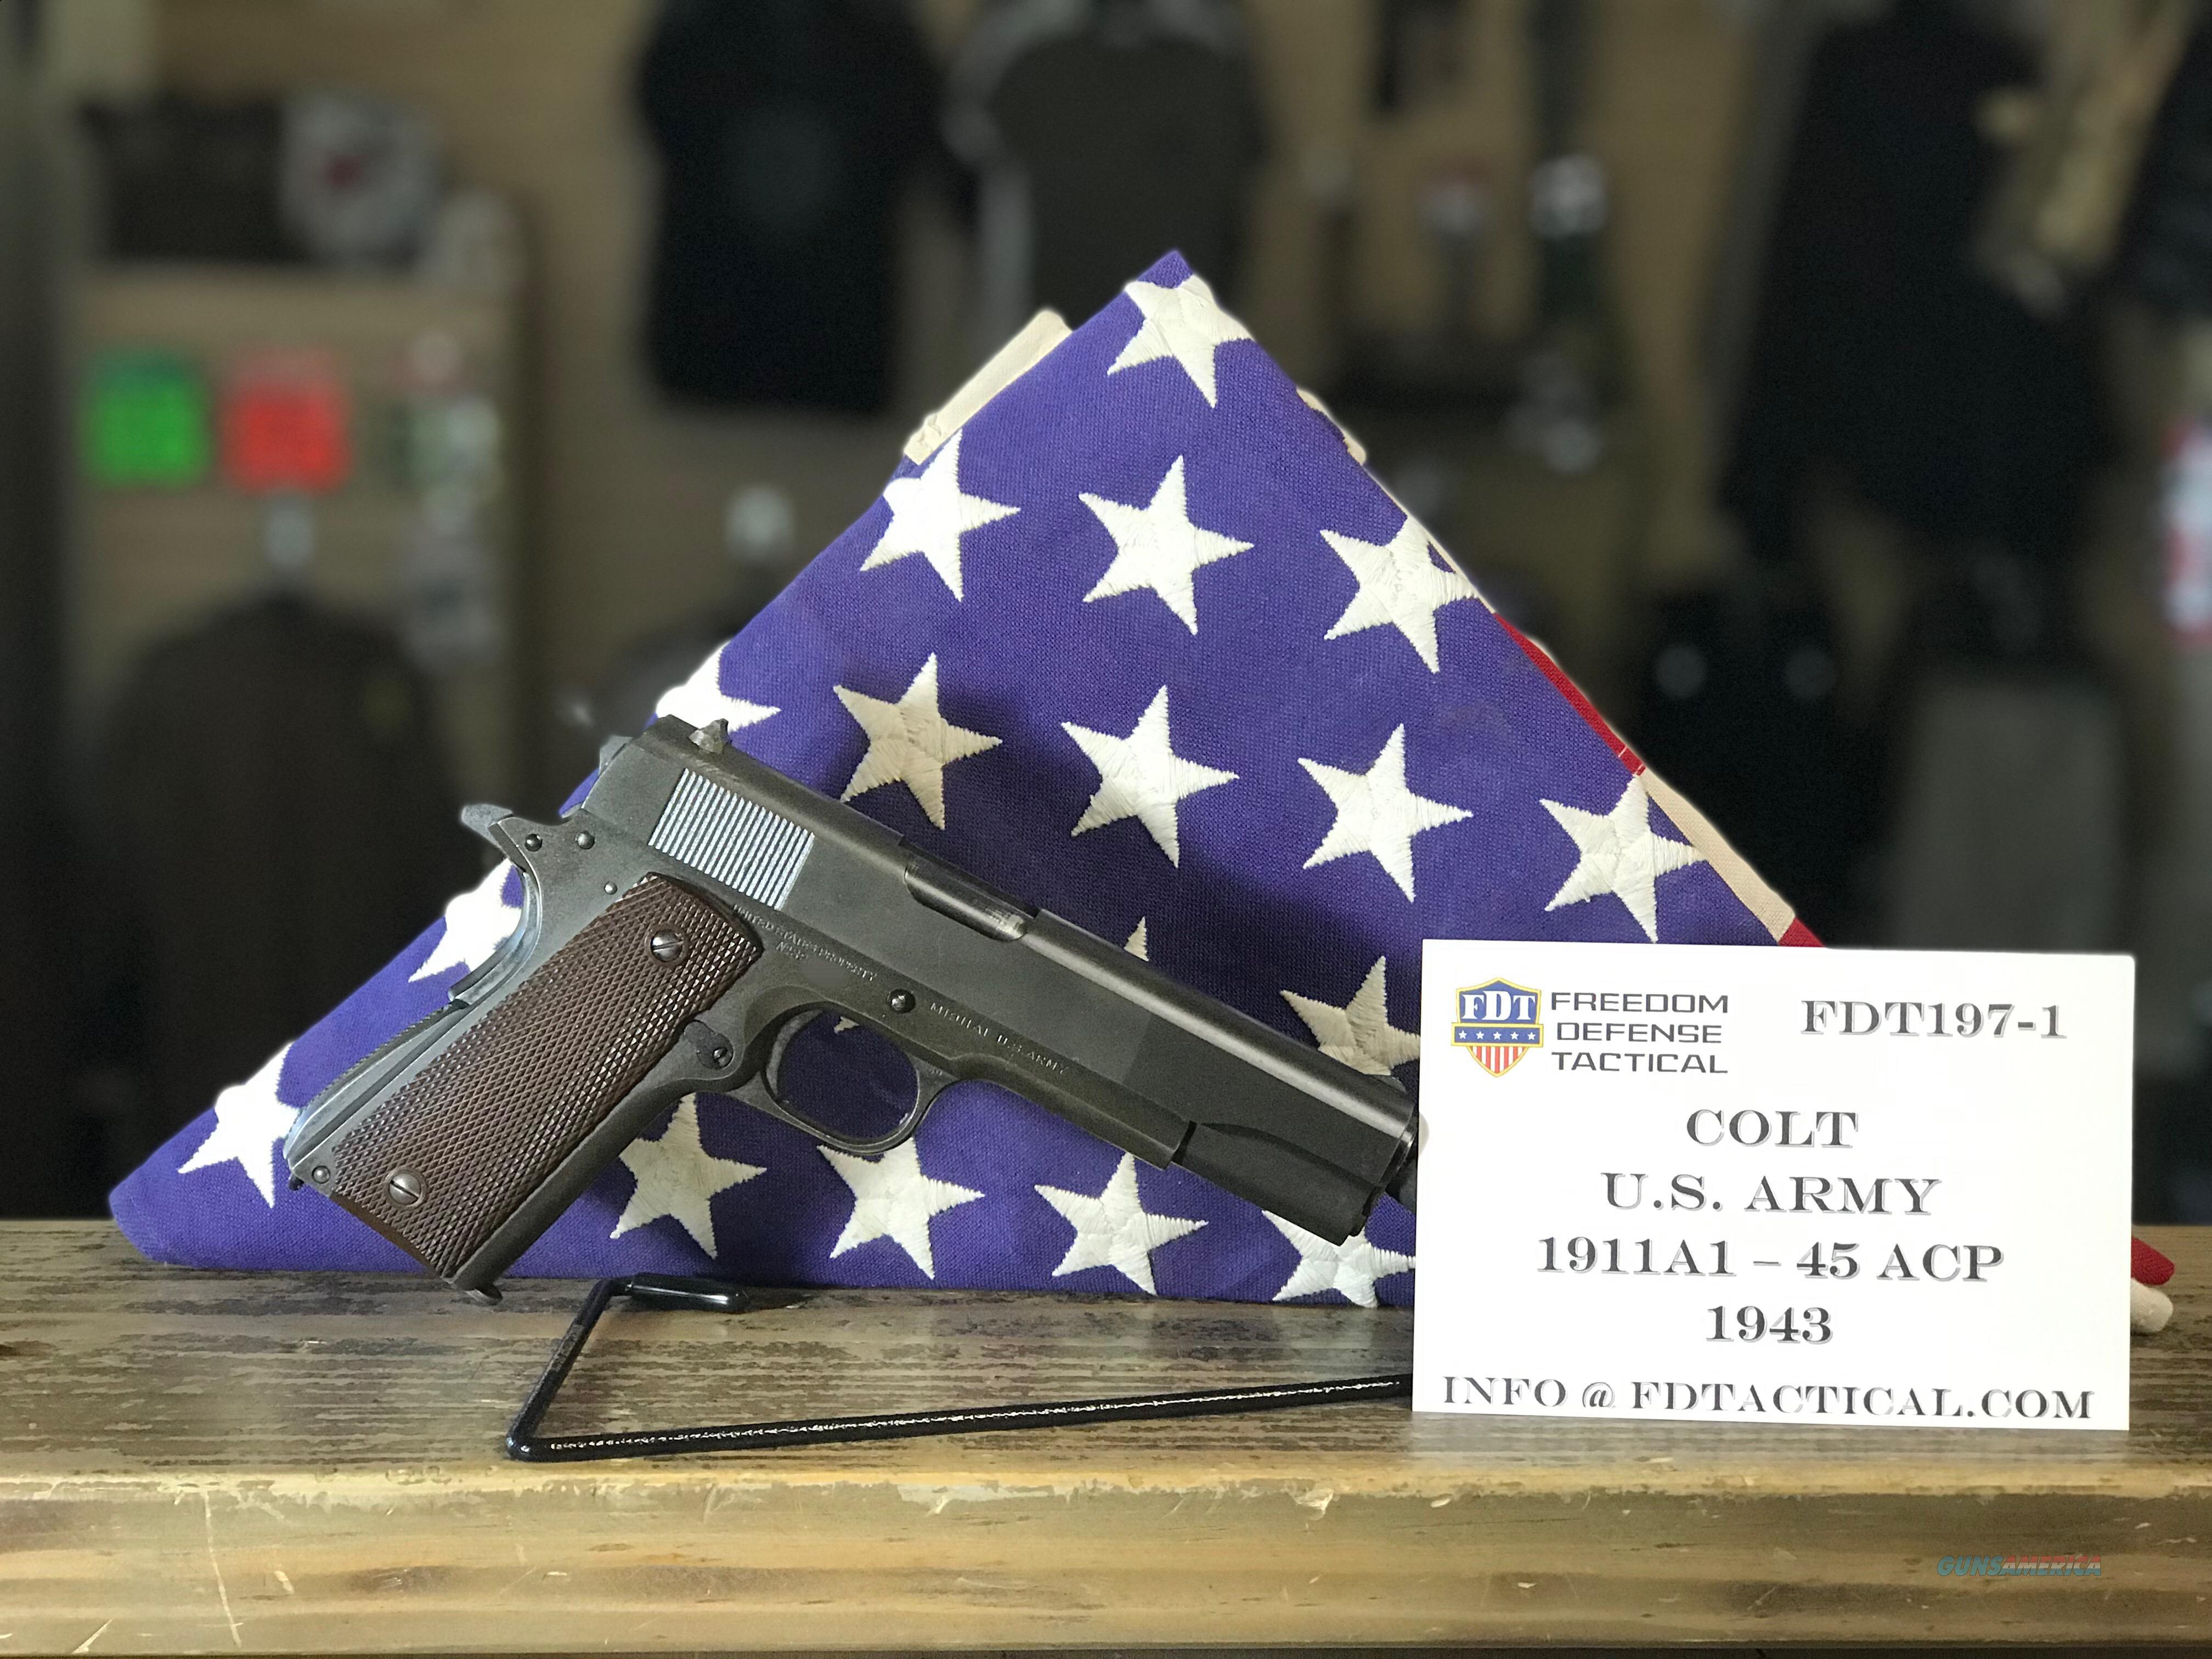 Colt 1911A1 45 ACP U.S. Army - 1943 Mfg Date  Guns > Pistols > Colt Automatic Pistols (1911 & Var)